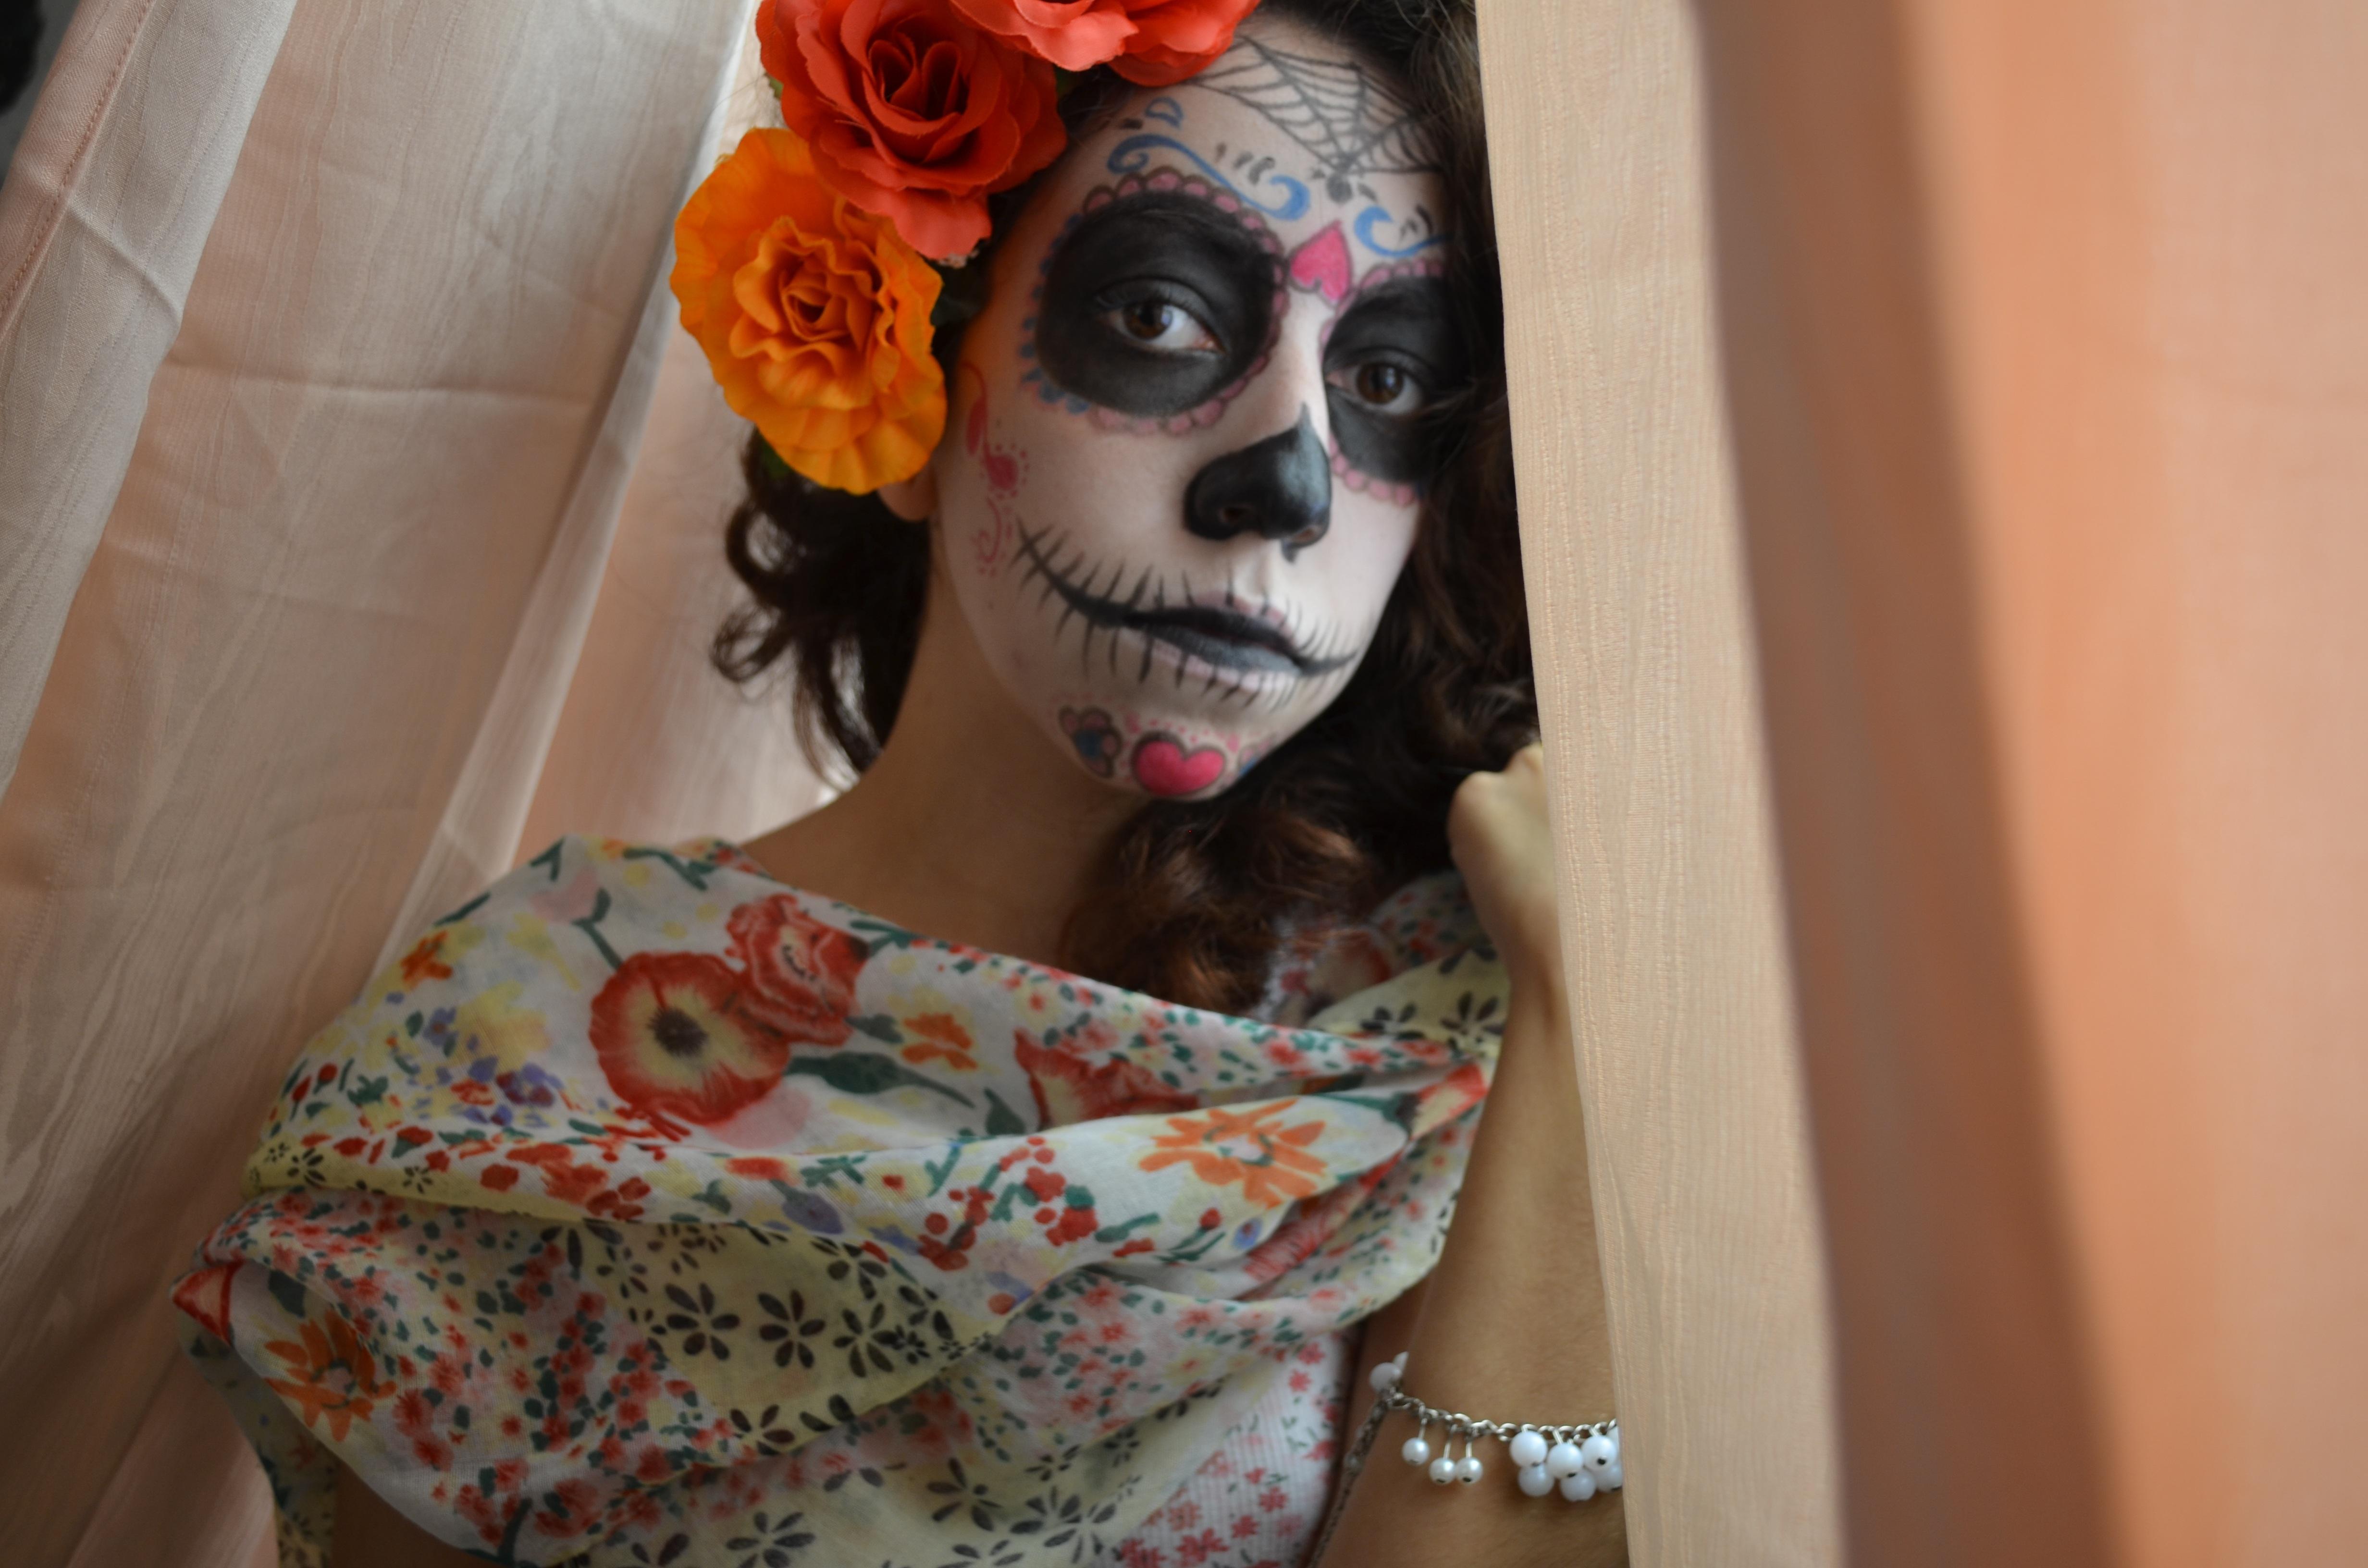 Fotos gratis : persona, mujer, ropa, muerte, pintura, maquillaje, payaso, cara, art, artesanía ...